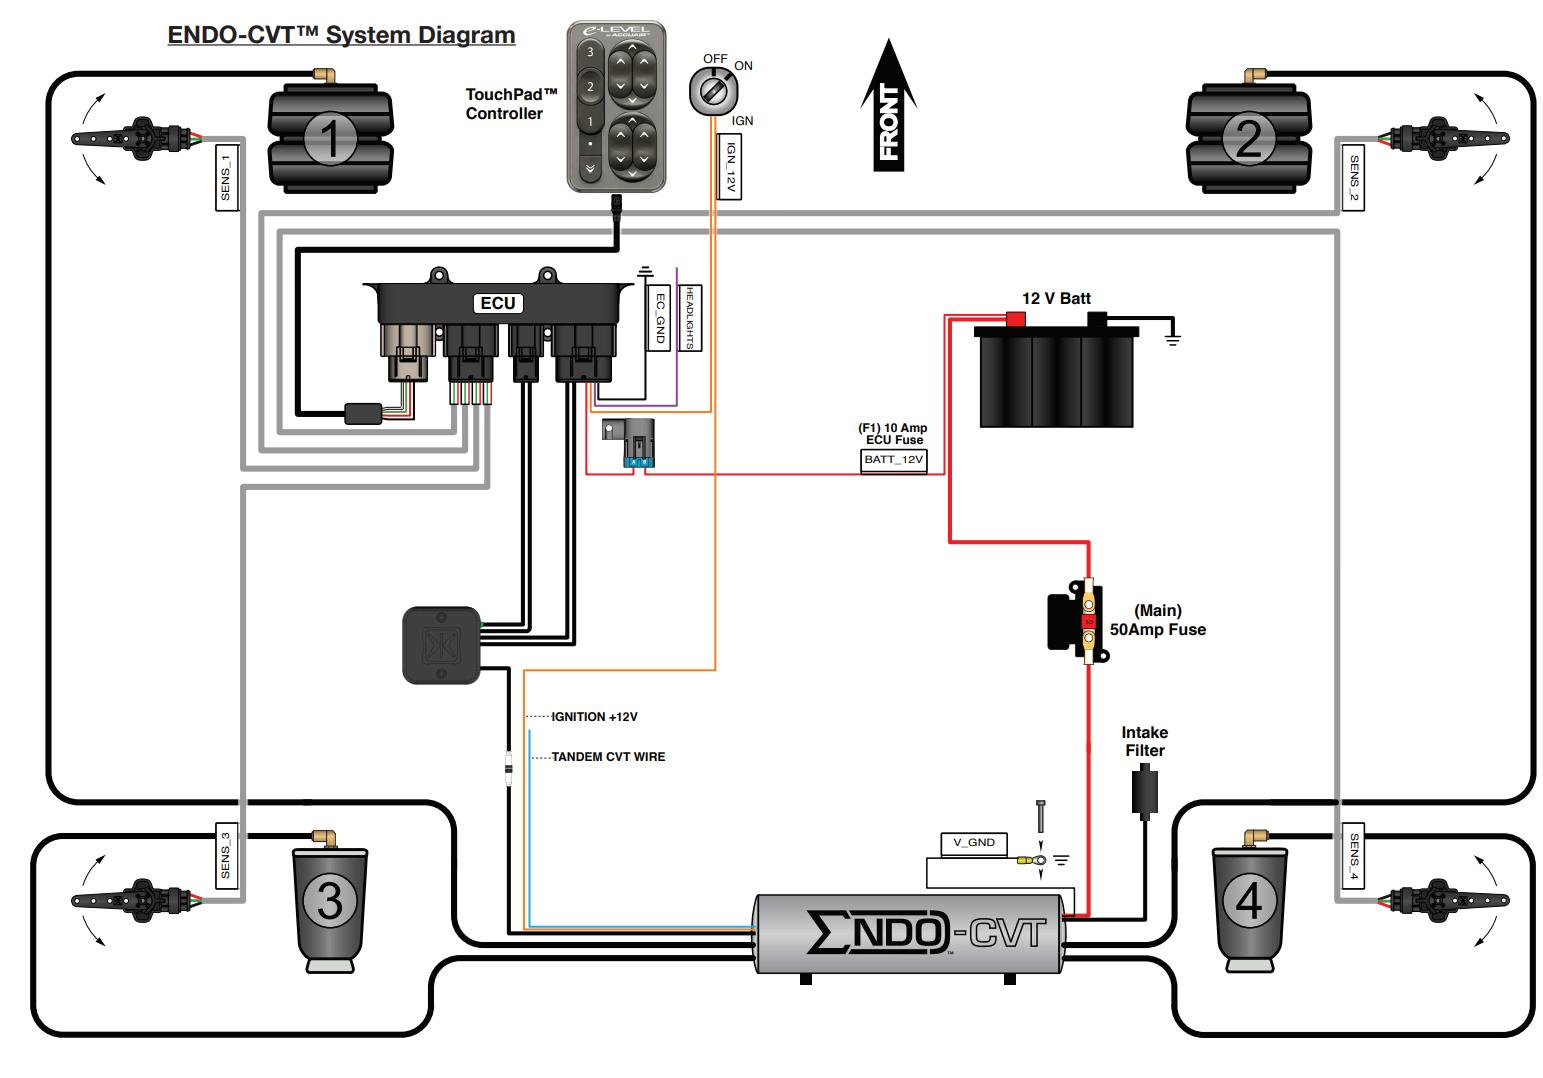 hight resolution of accuair endo cvt system diagram